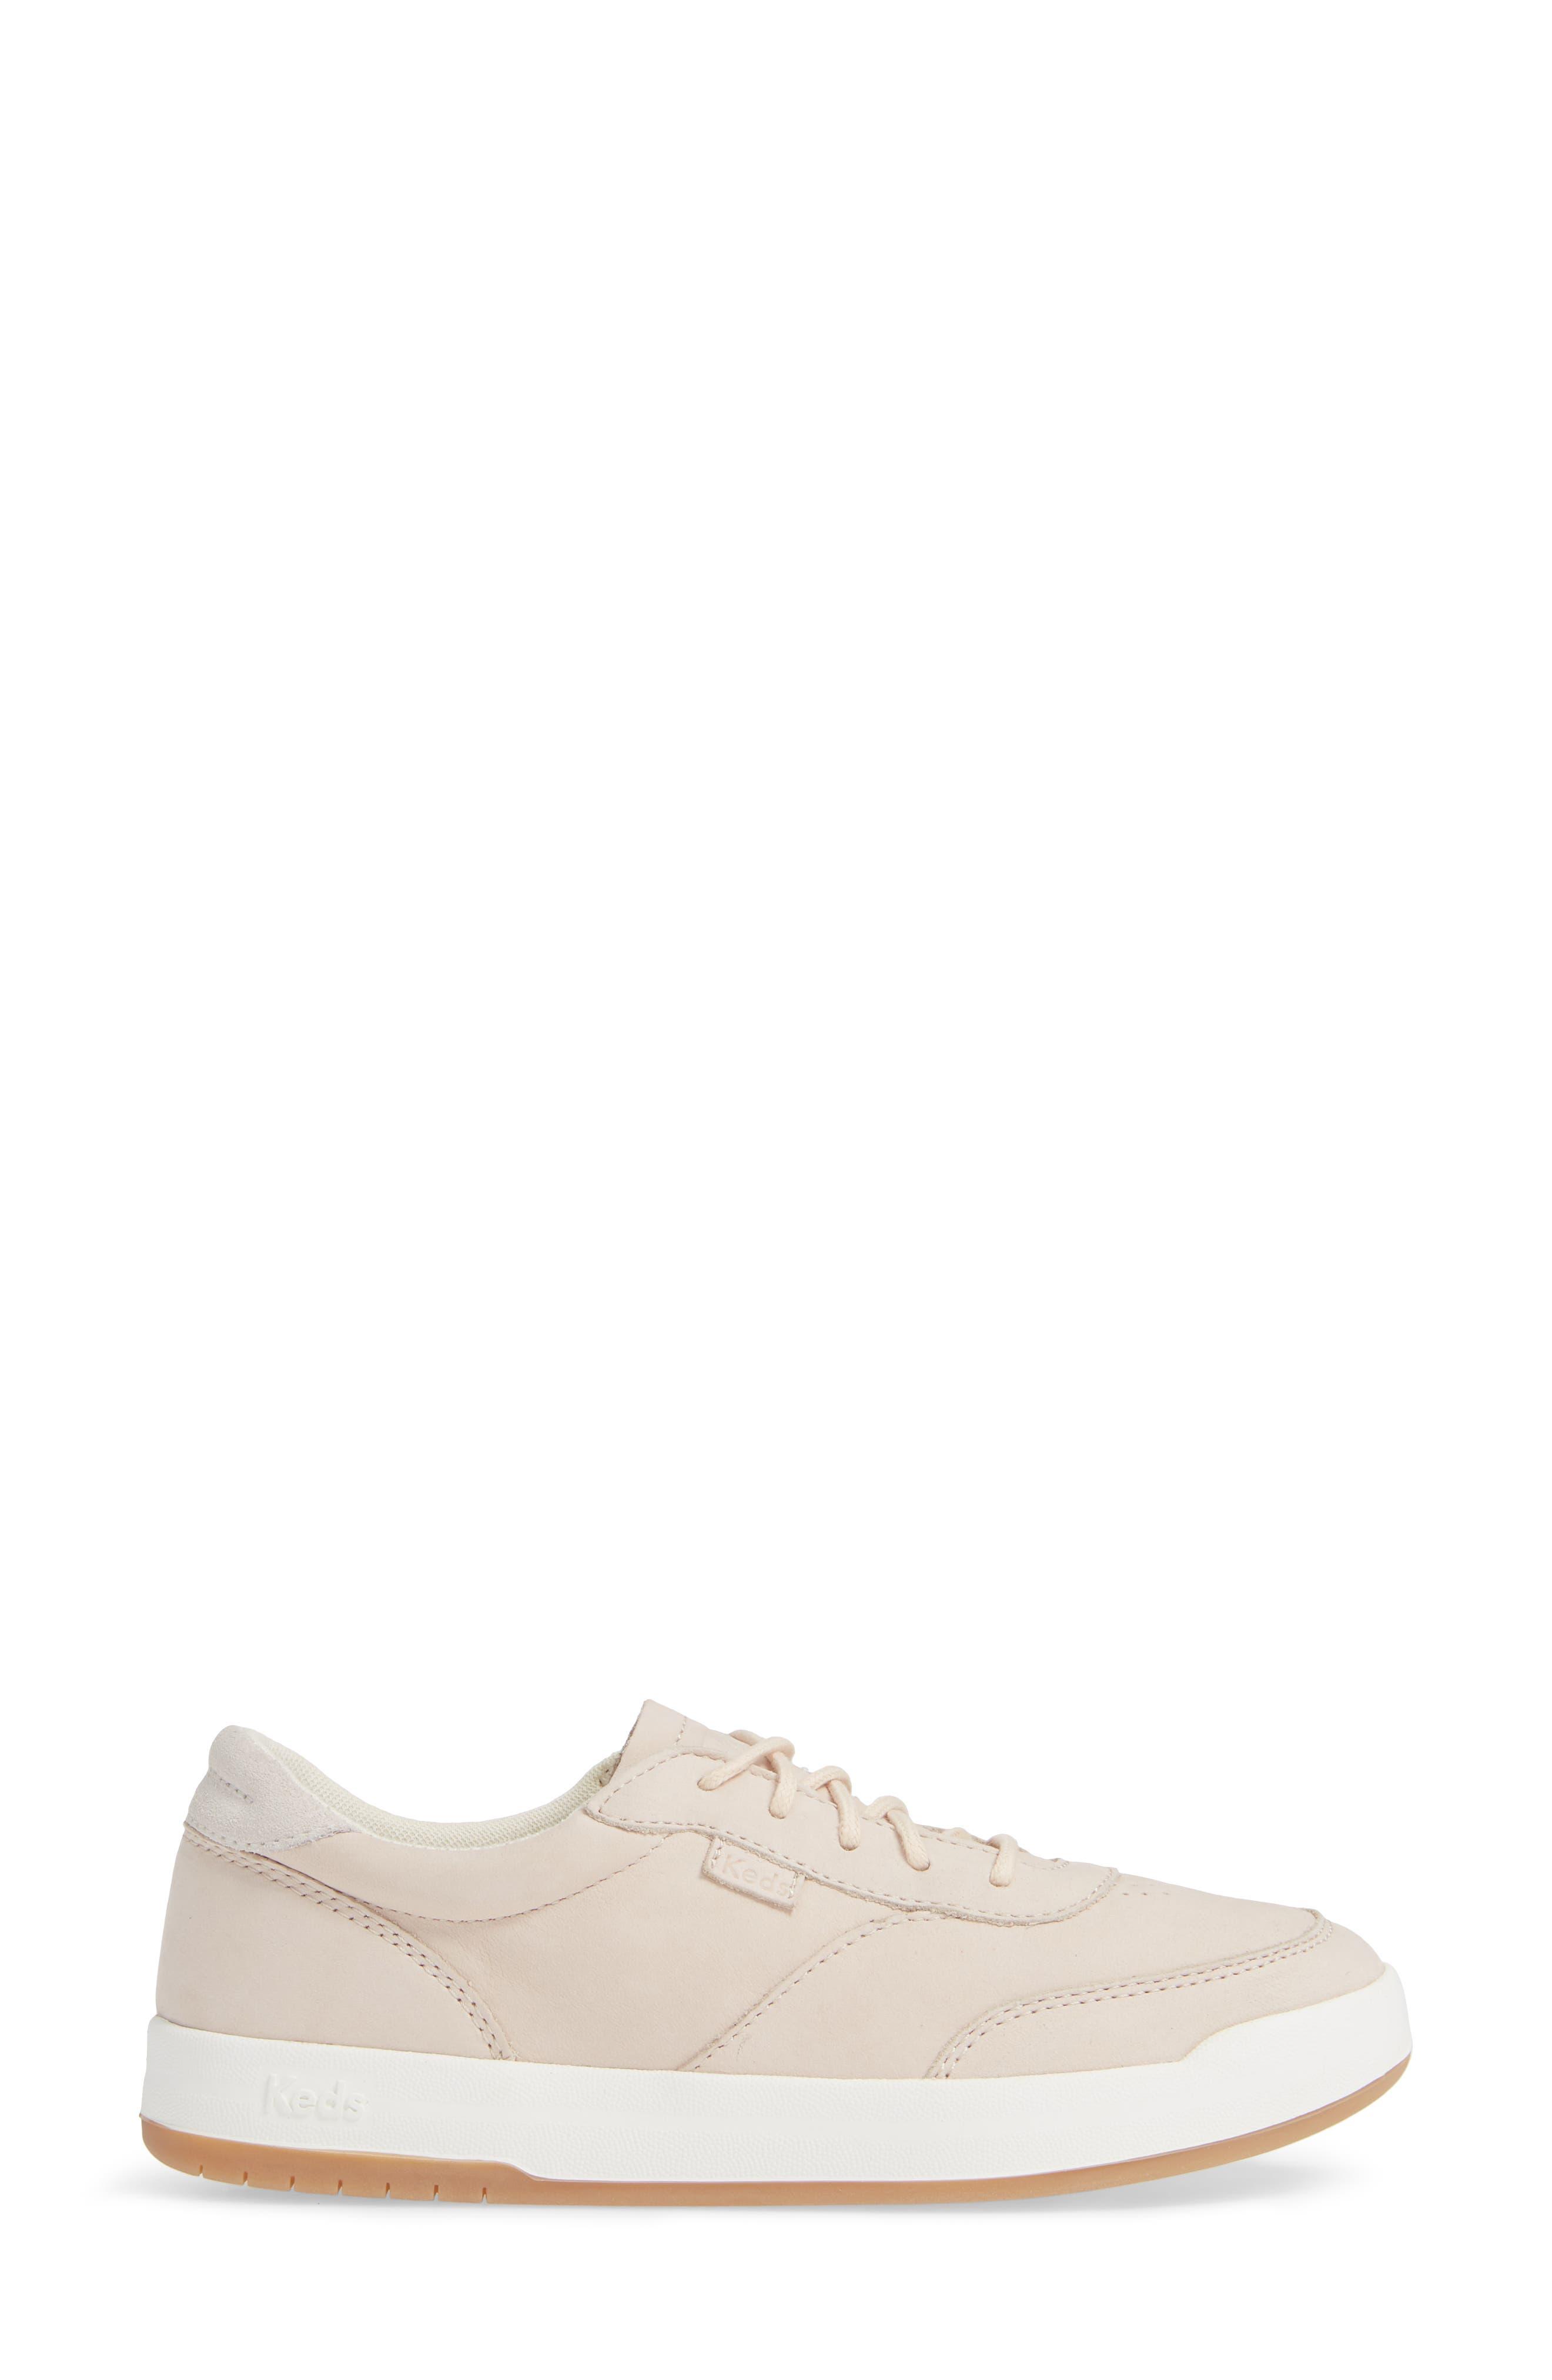 Match Point Sneaker,                             Alternate thumbnail 3, color,                             685